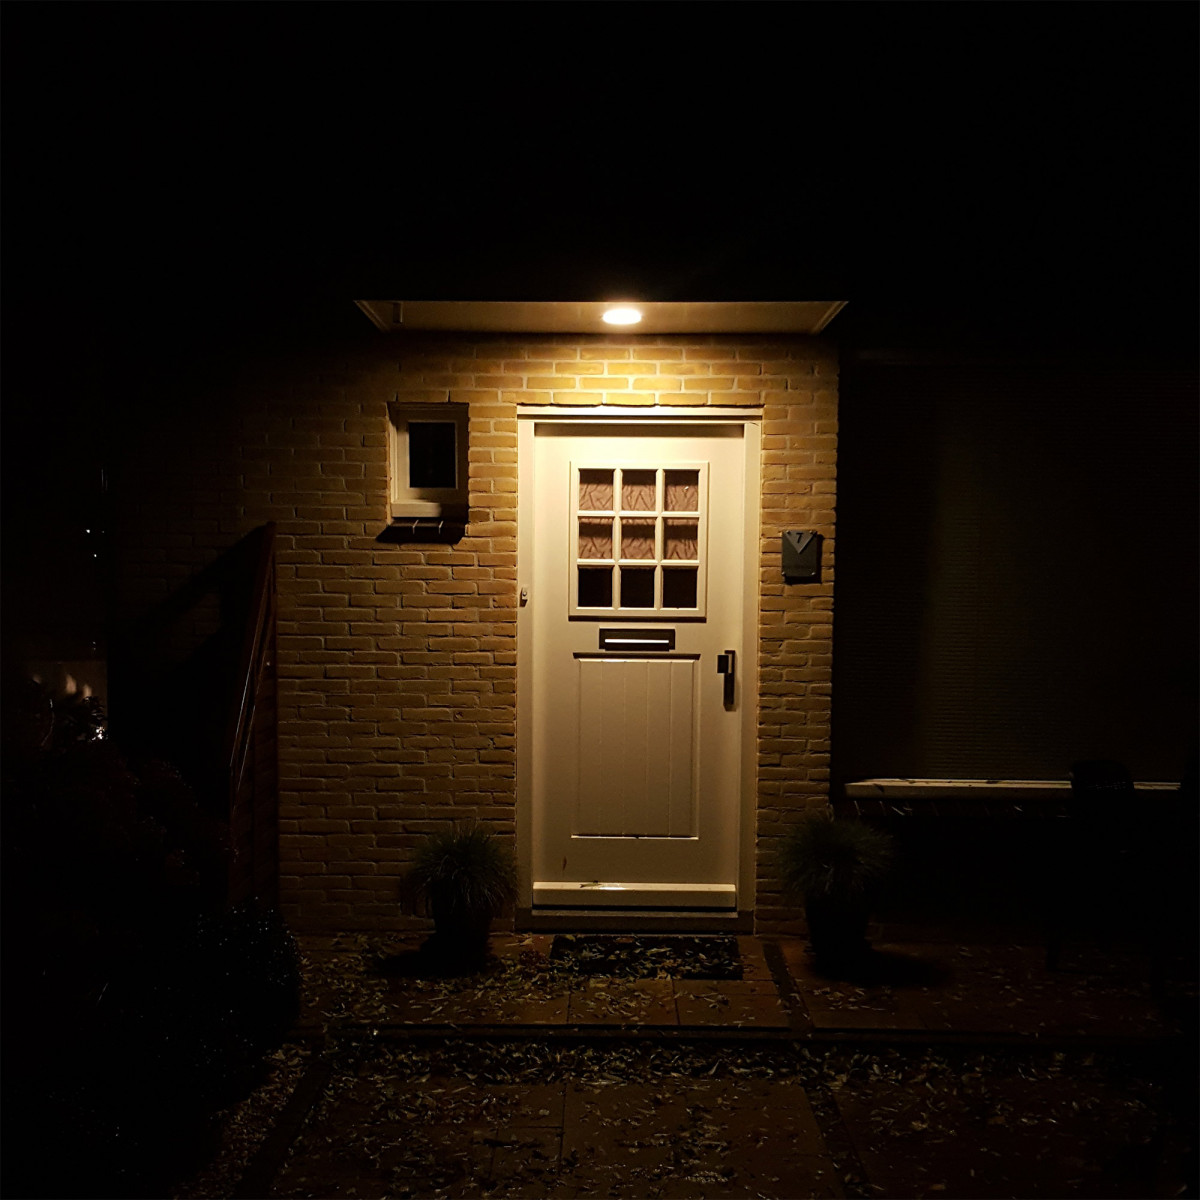 Einbau LED Spot, Einbauen